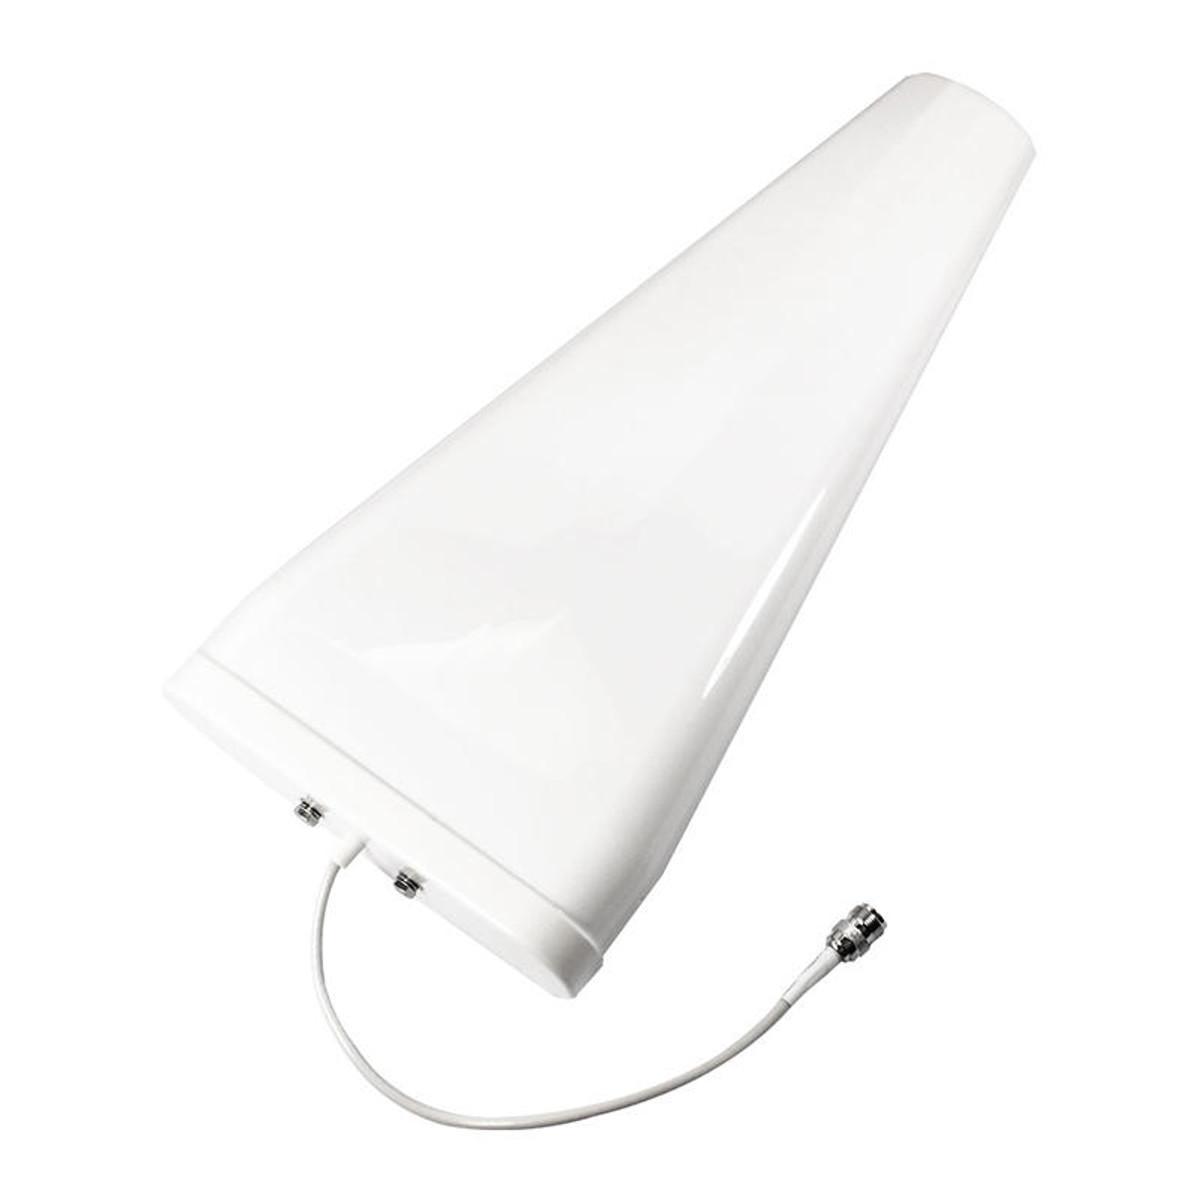 SureCall SureCall Full-Band Yagi Antenna 75 Ohm or SC-231W